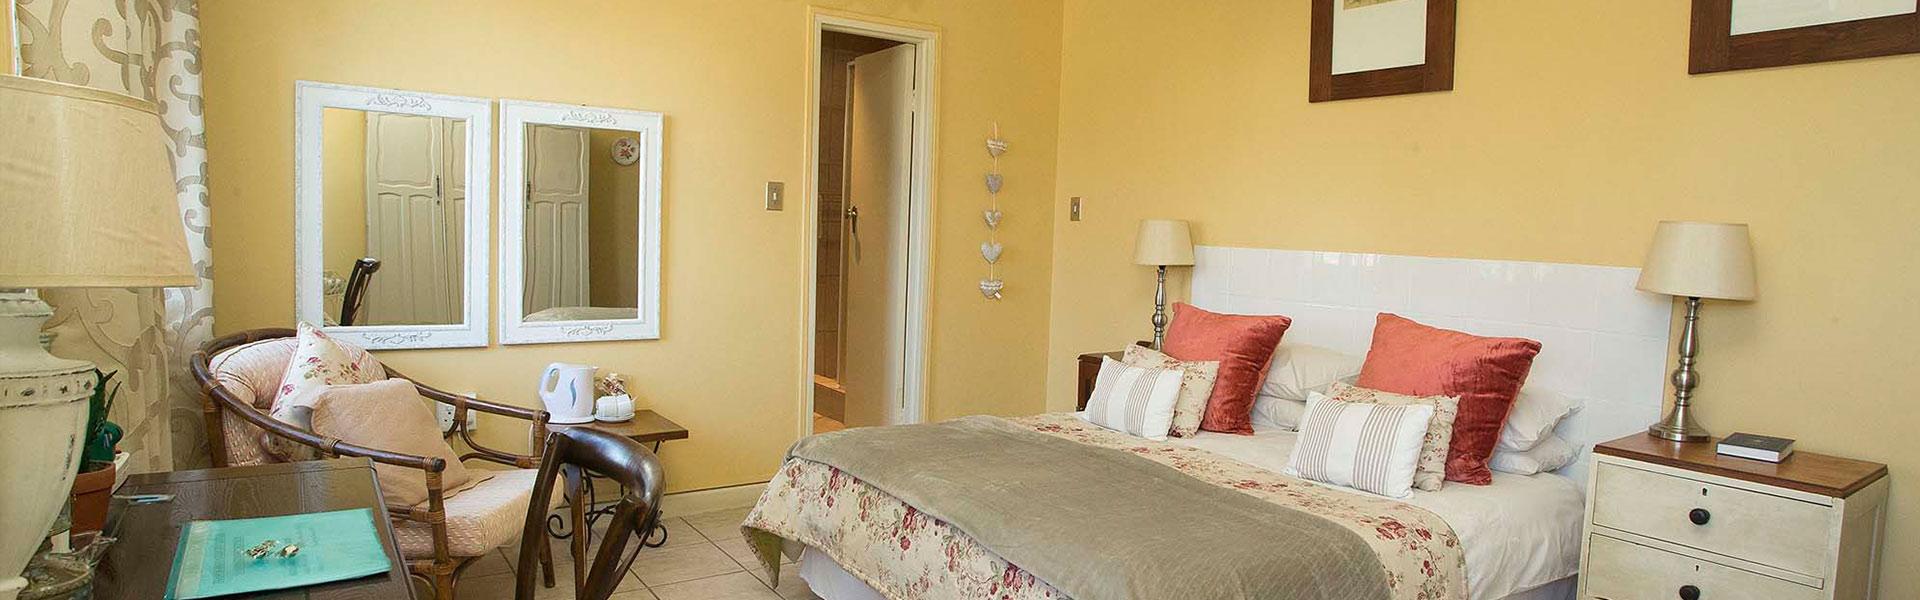 roomslide02